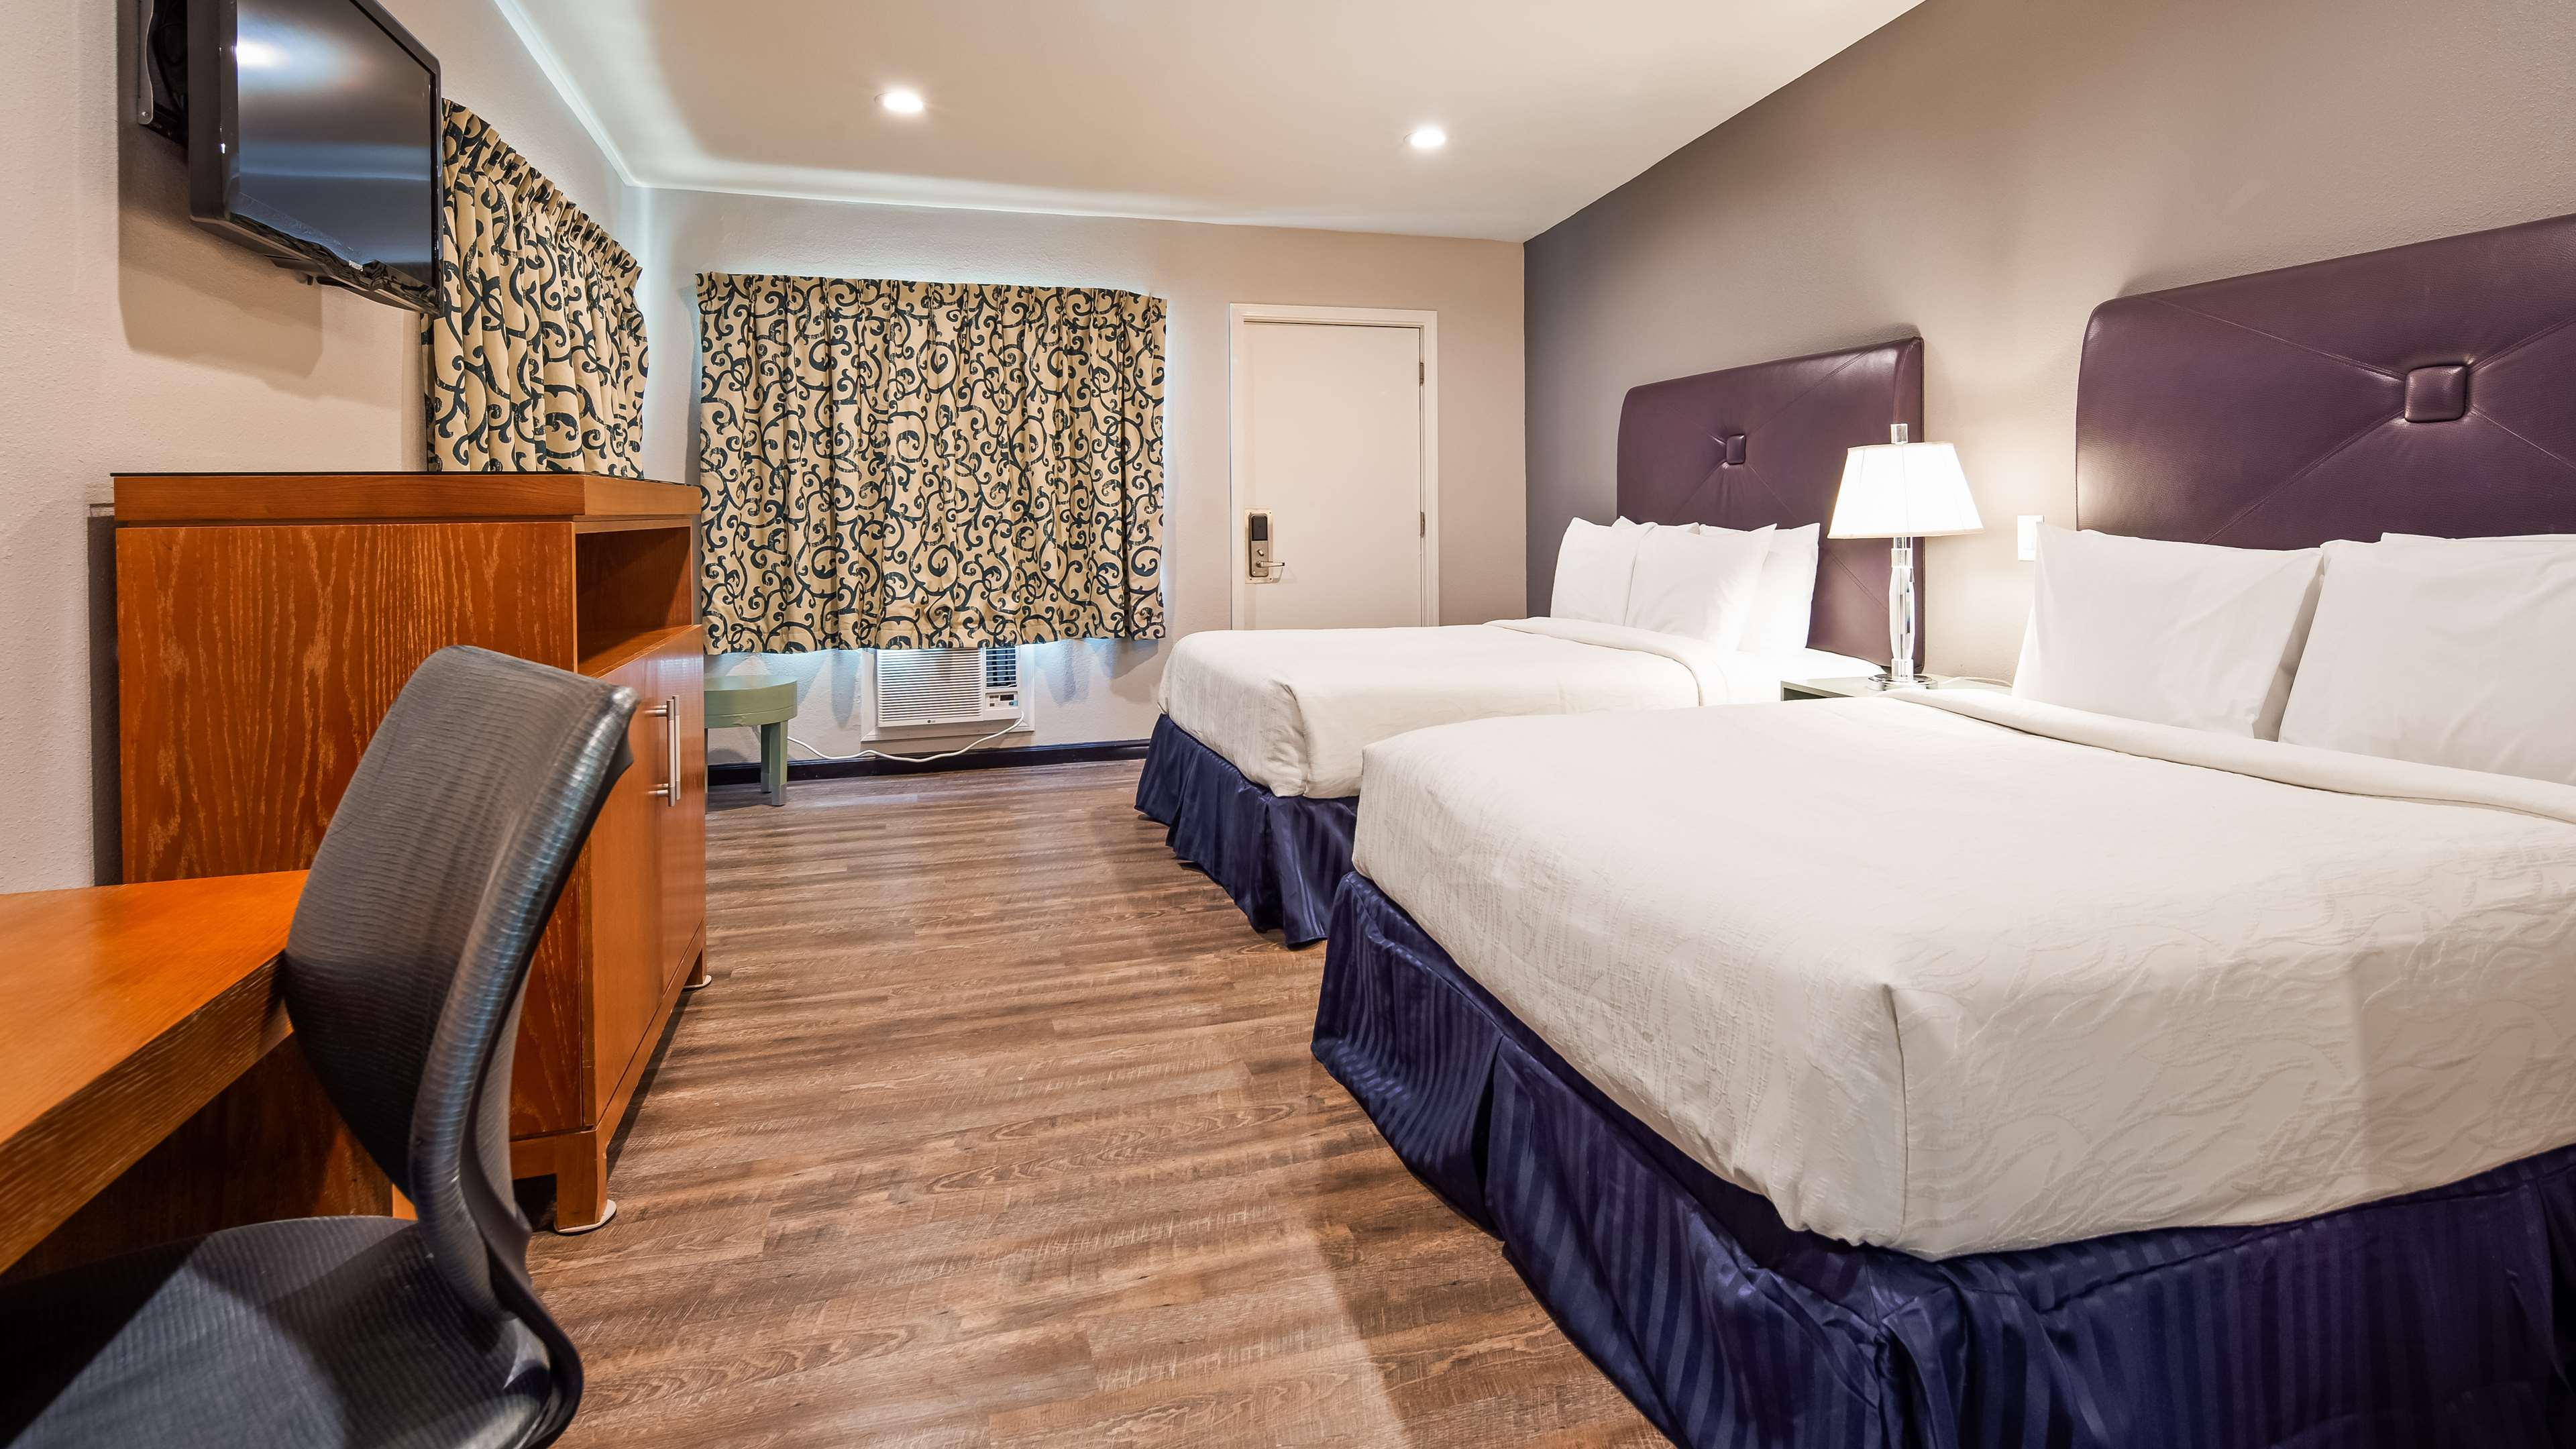 SureStay Hotel by Best Western Ridgecrest image 7